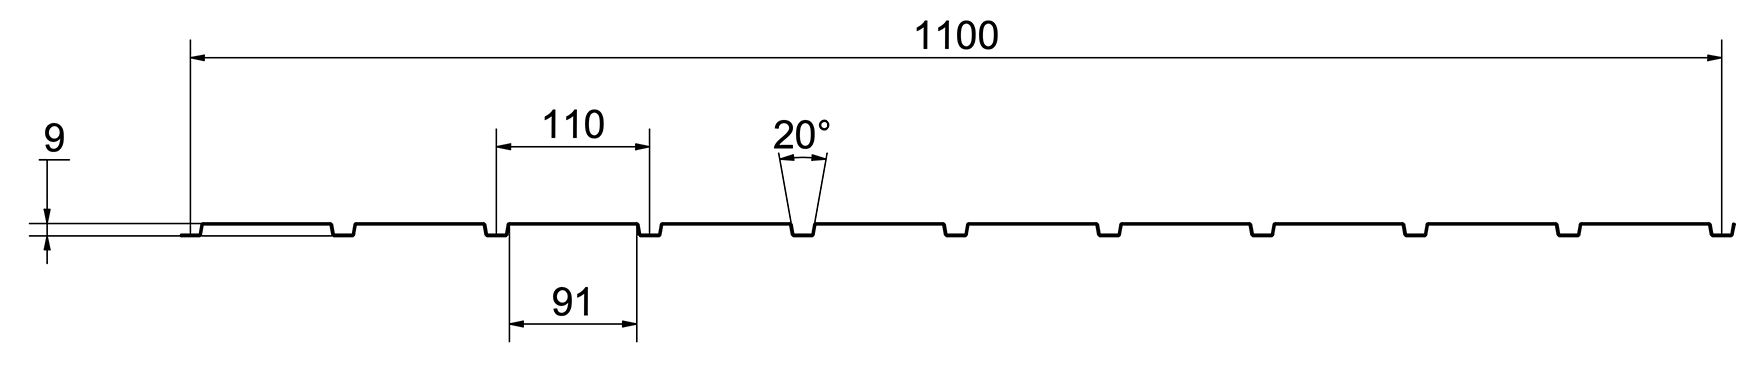 tr10 diagram